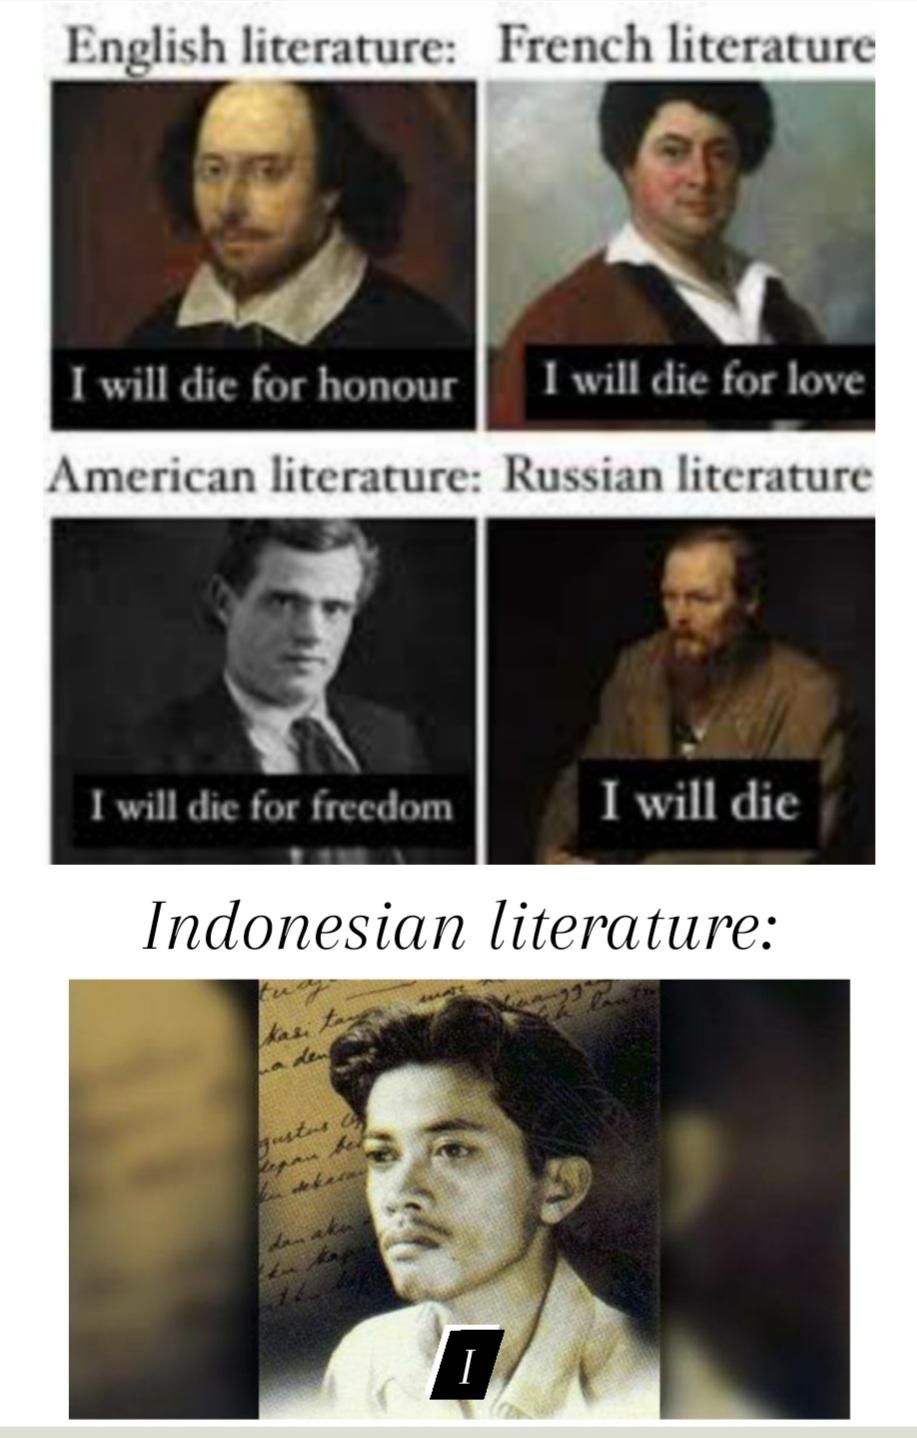 English Major Memes Image Memes English Major Memes Memes English Major Memes Meme Pictures Funny Memes English Major English Language Funny Funny Memes